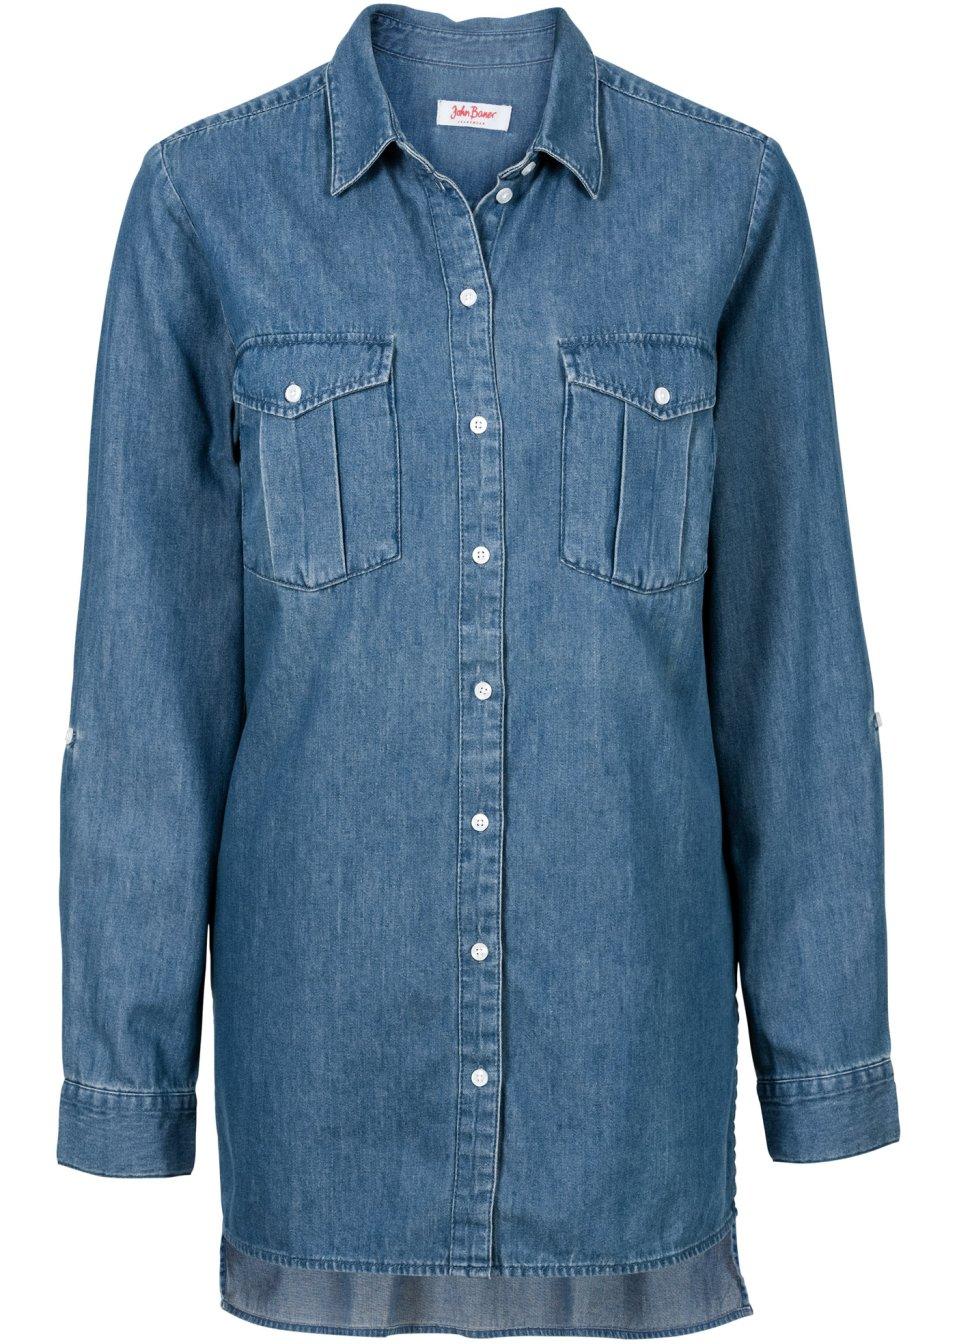 L ssiges hemd mit brusttaschen blau for Jeanshemd lang damen